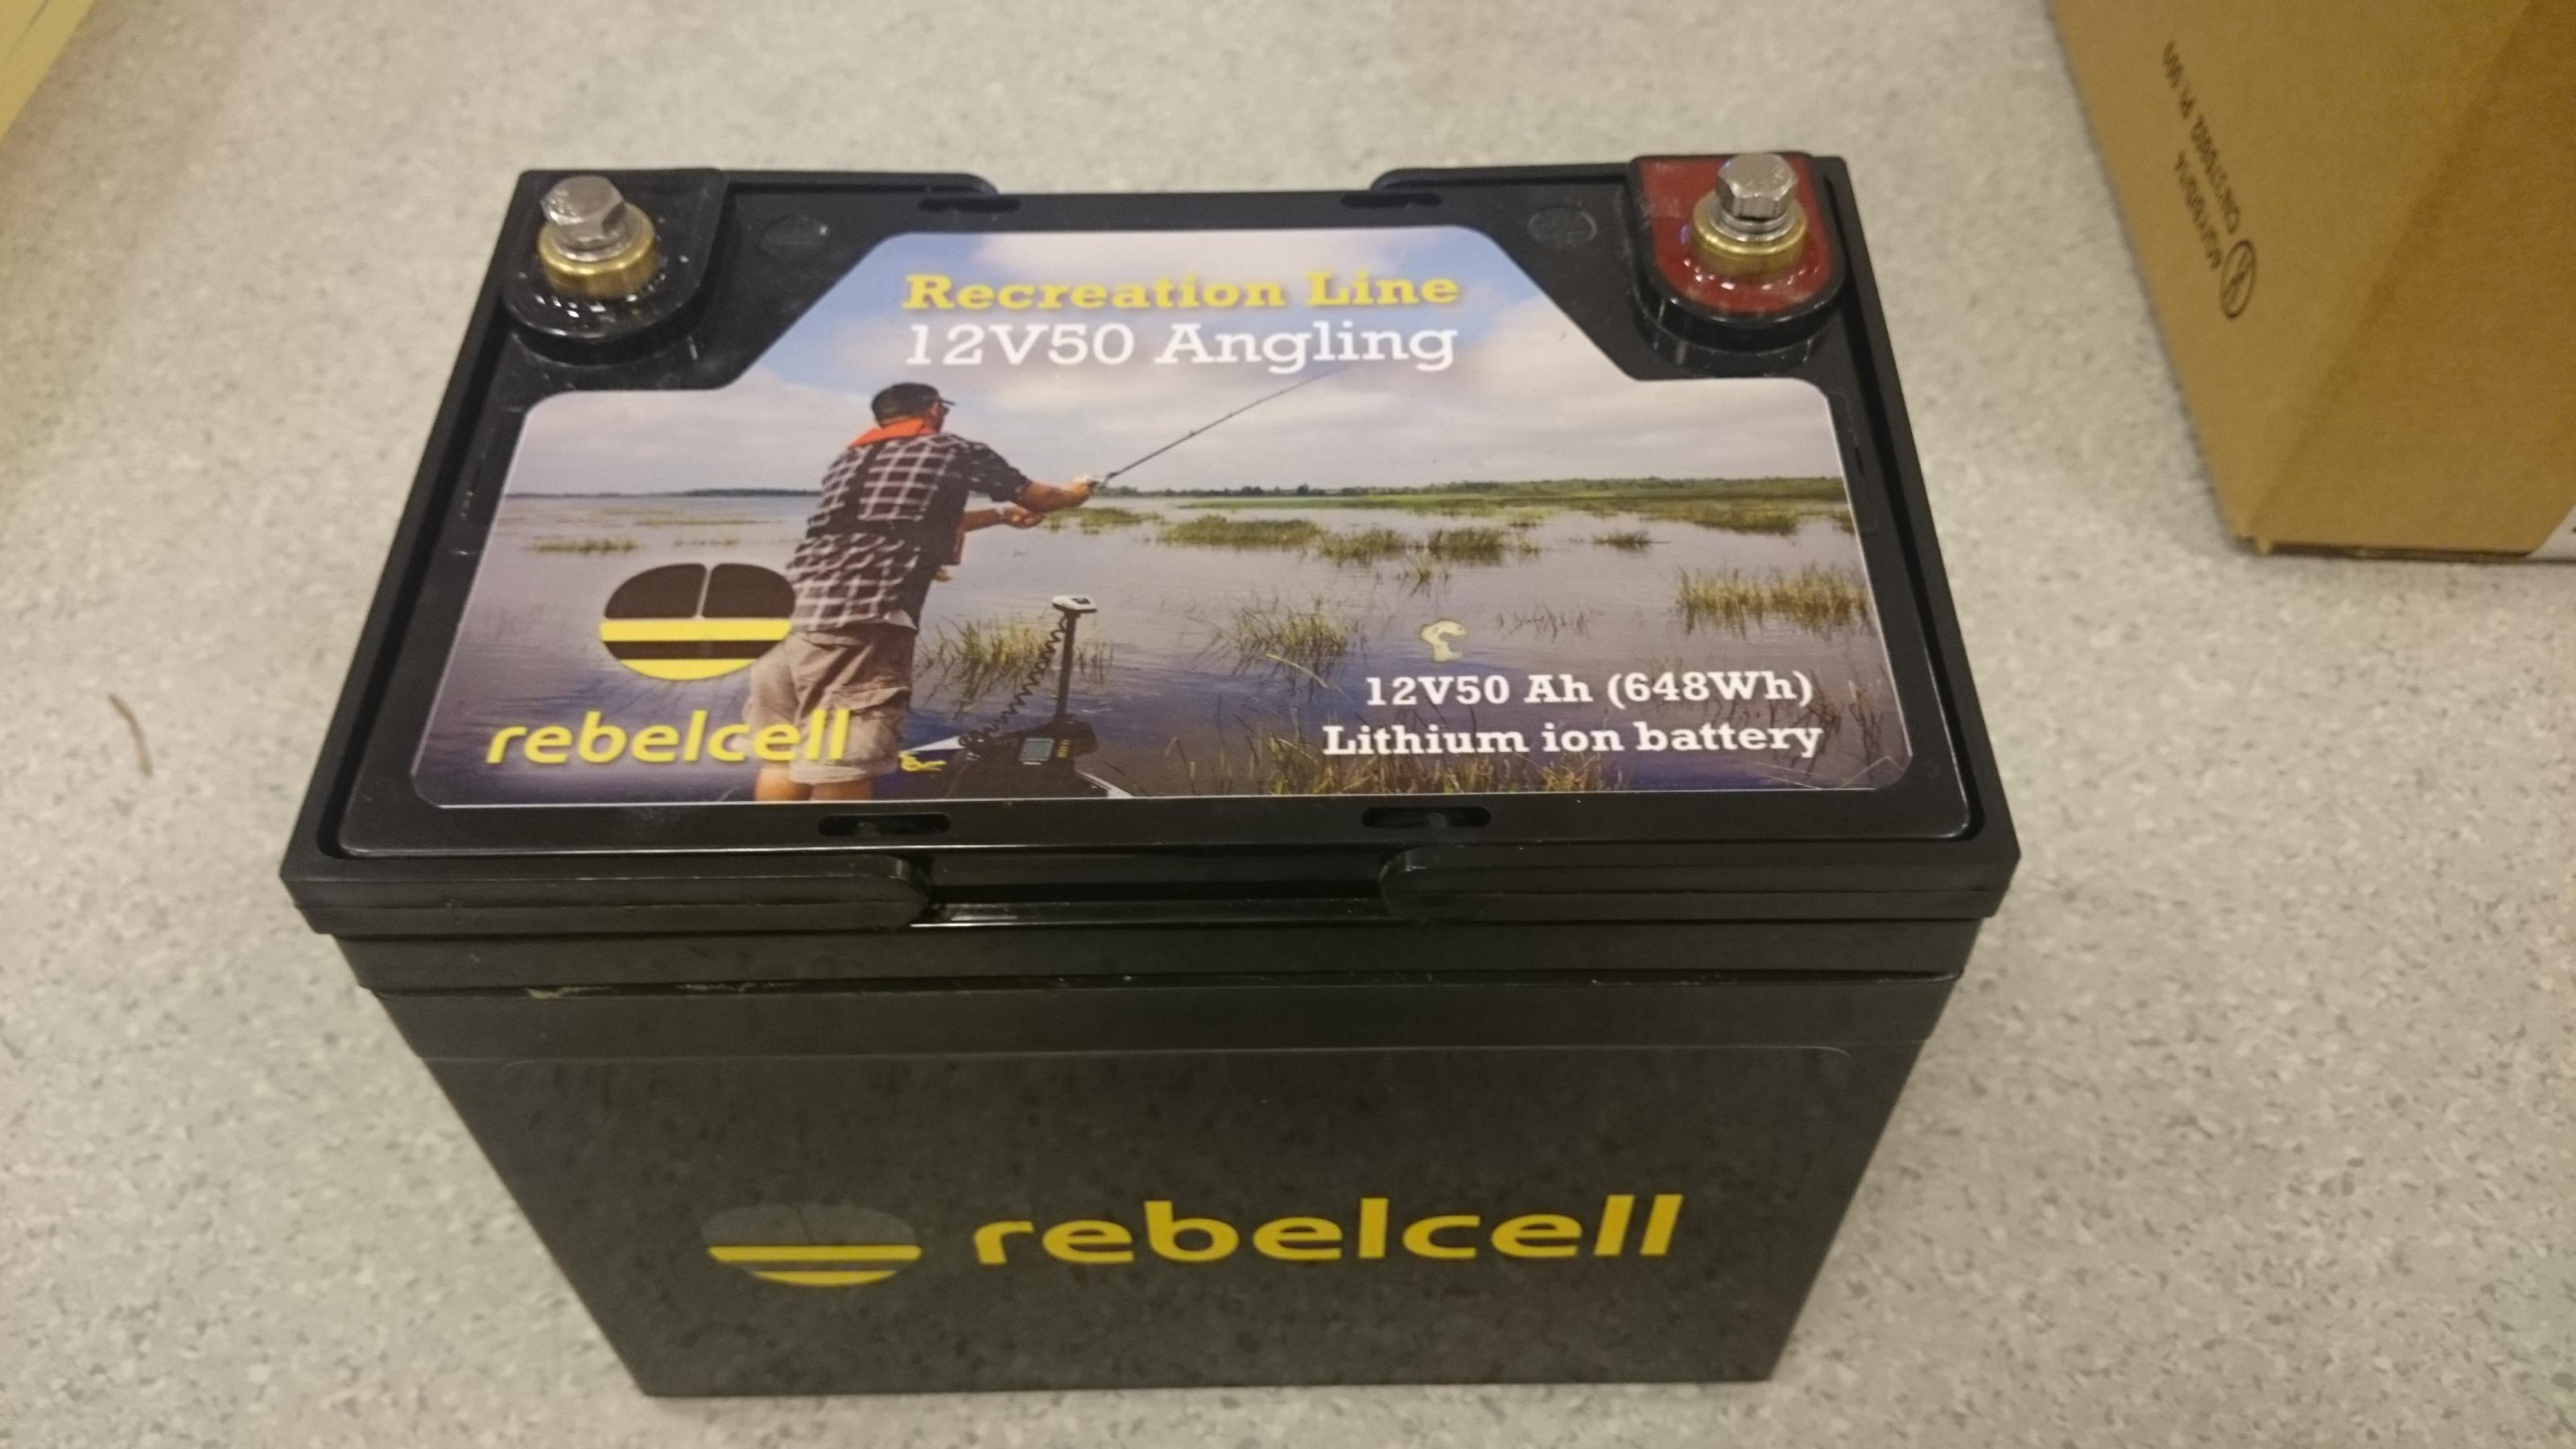 rebelcell_01.jpg